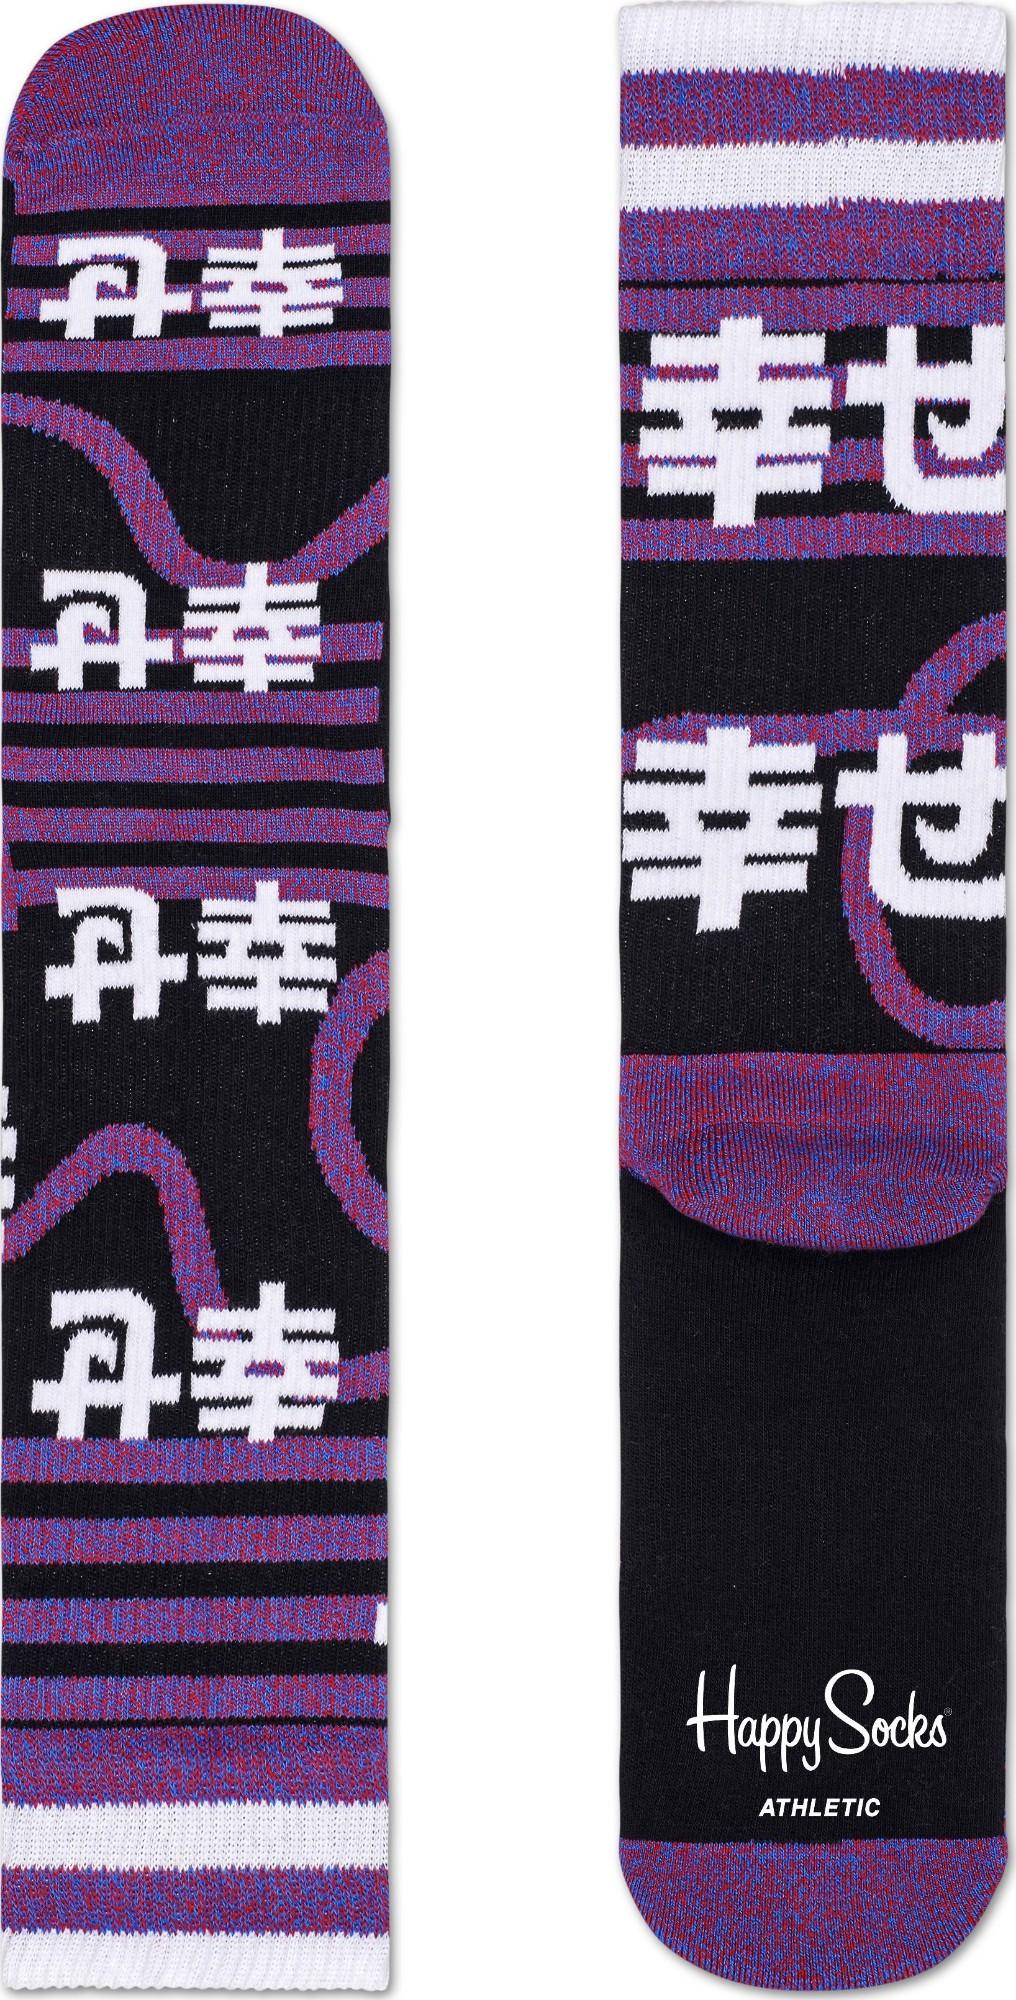 Happy Socks Athletic Japan Multi 9300 36-40